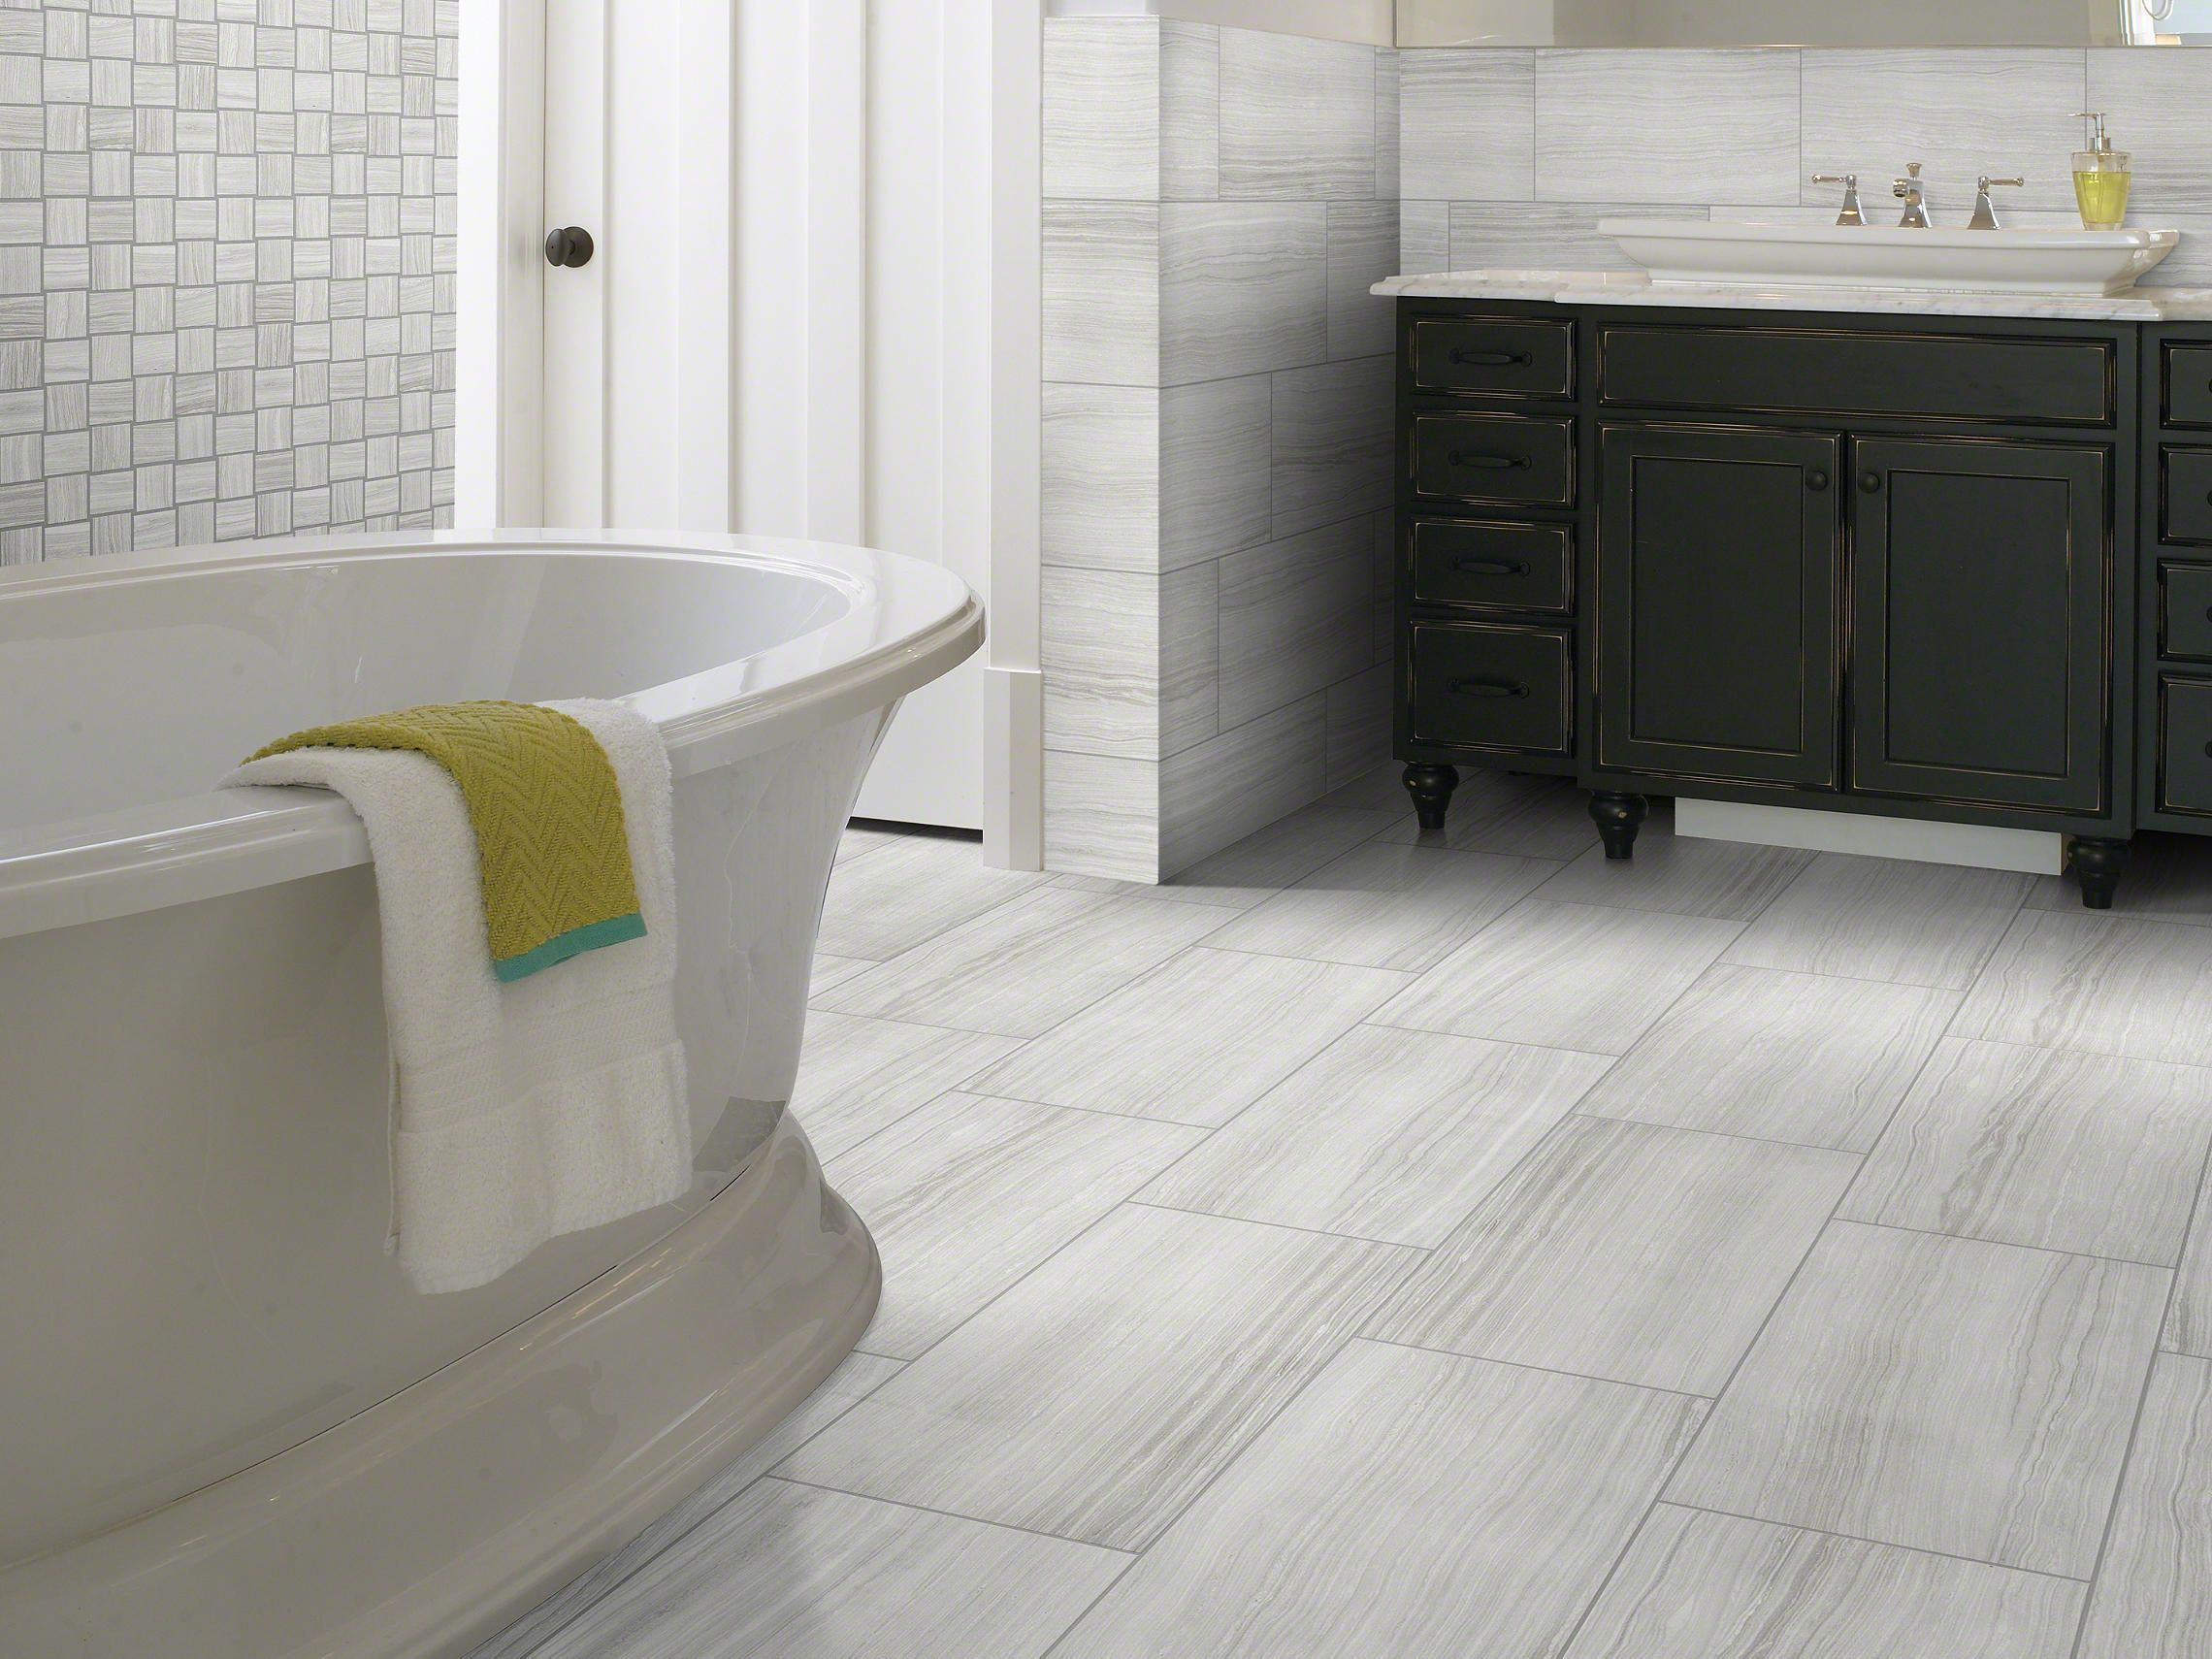 Lockport Glacier tile for master bath floor | New House | Pinterest ...